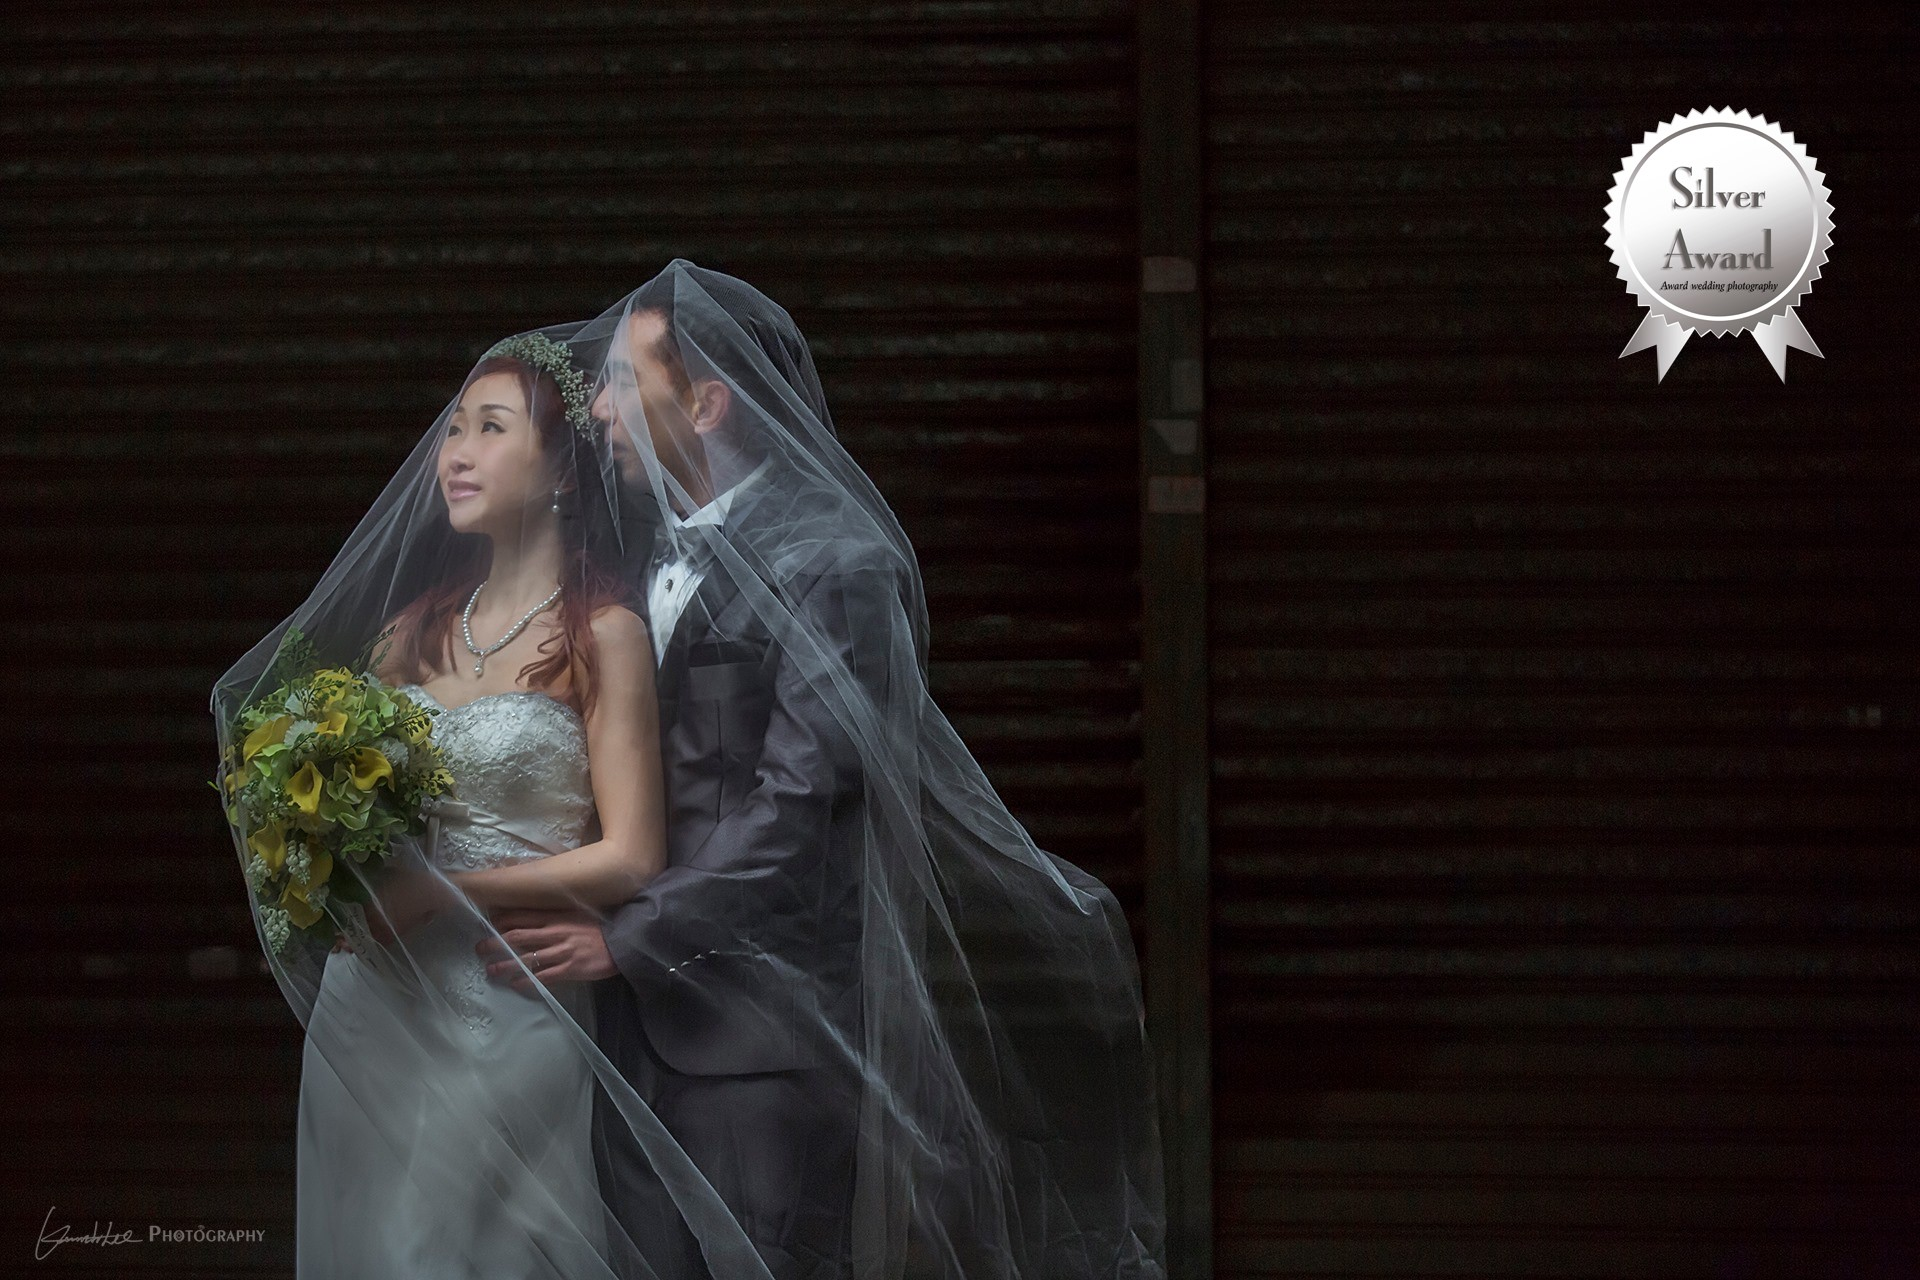 Award_Wedding_Photography